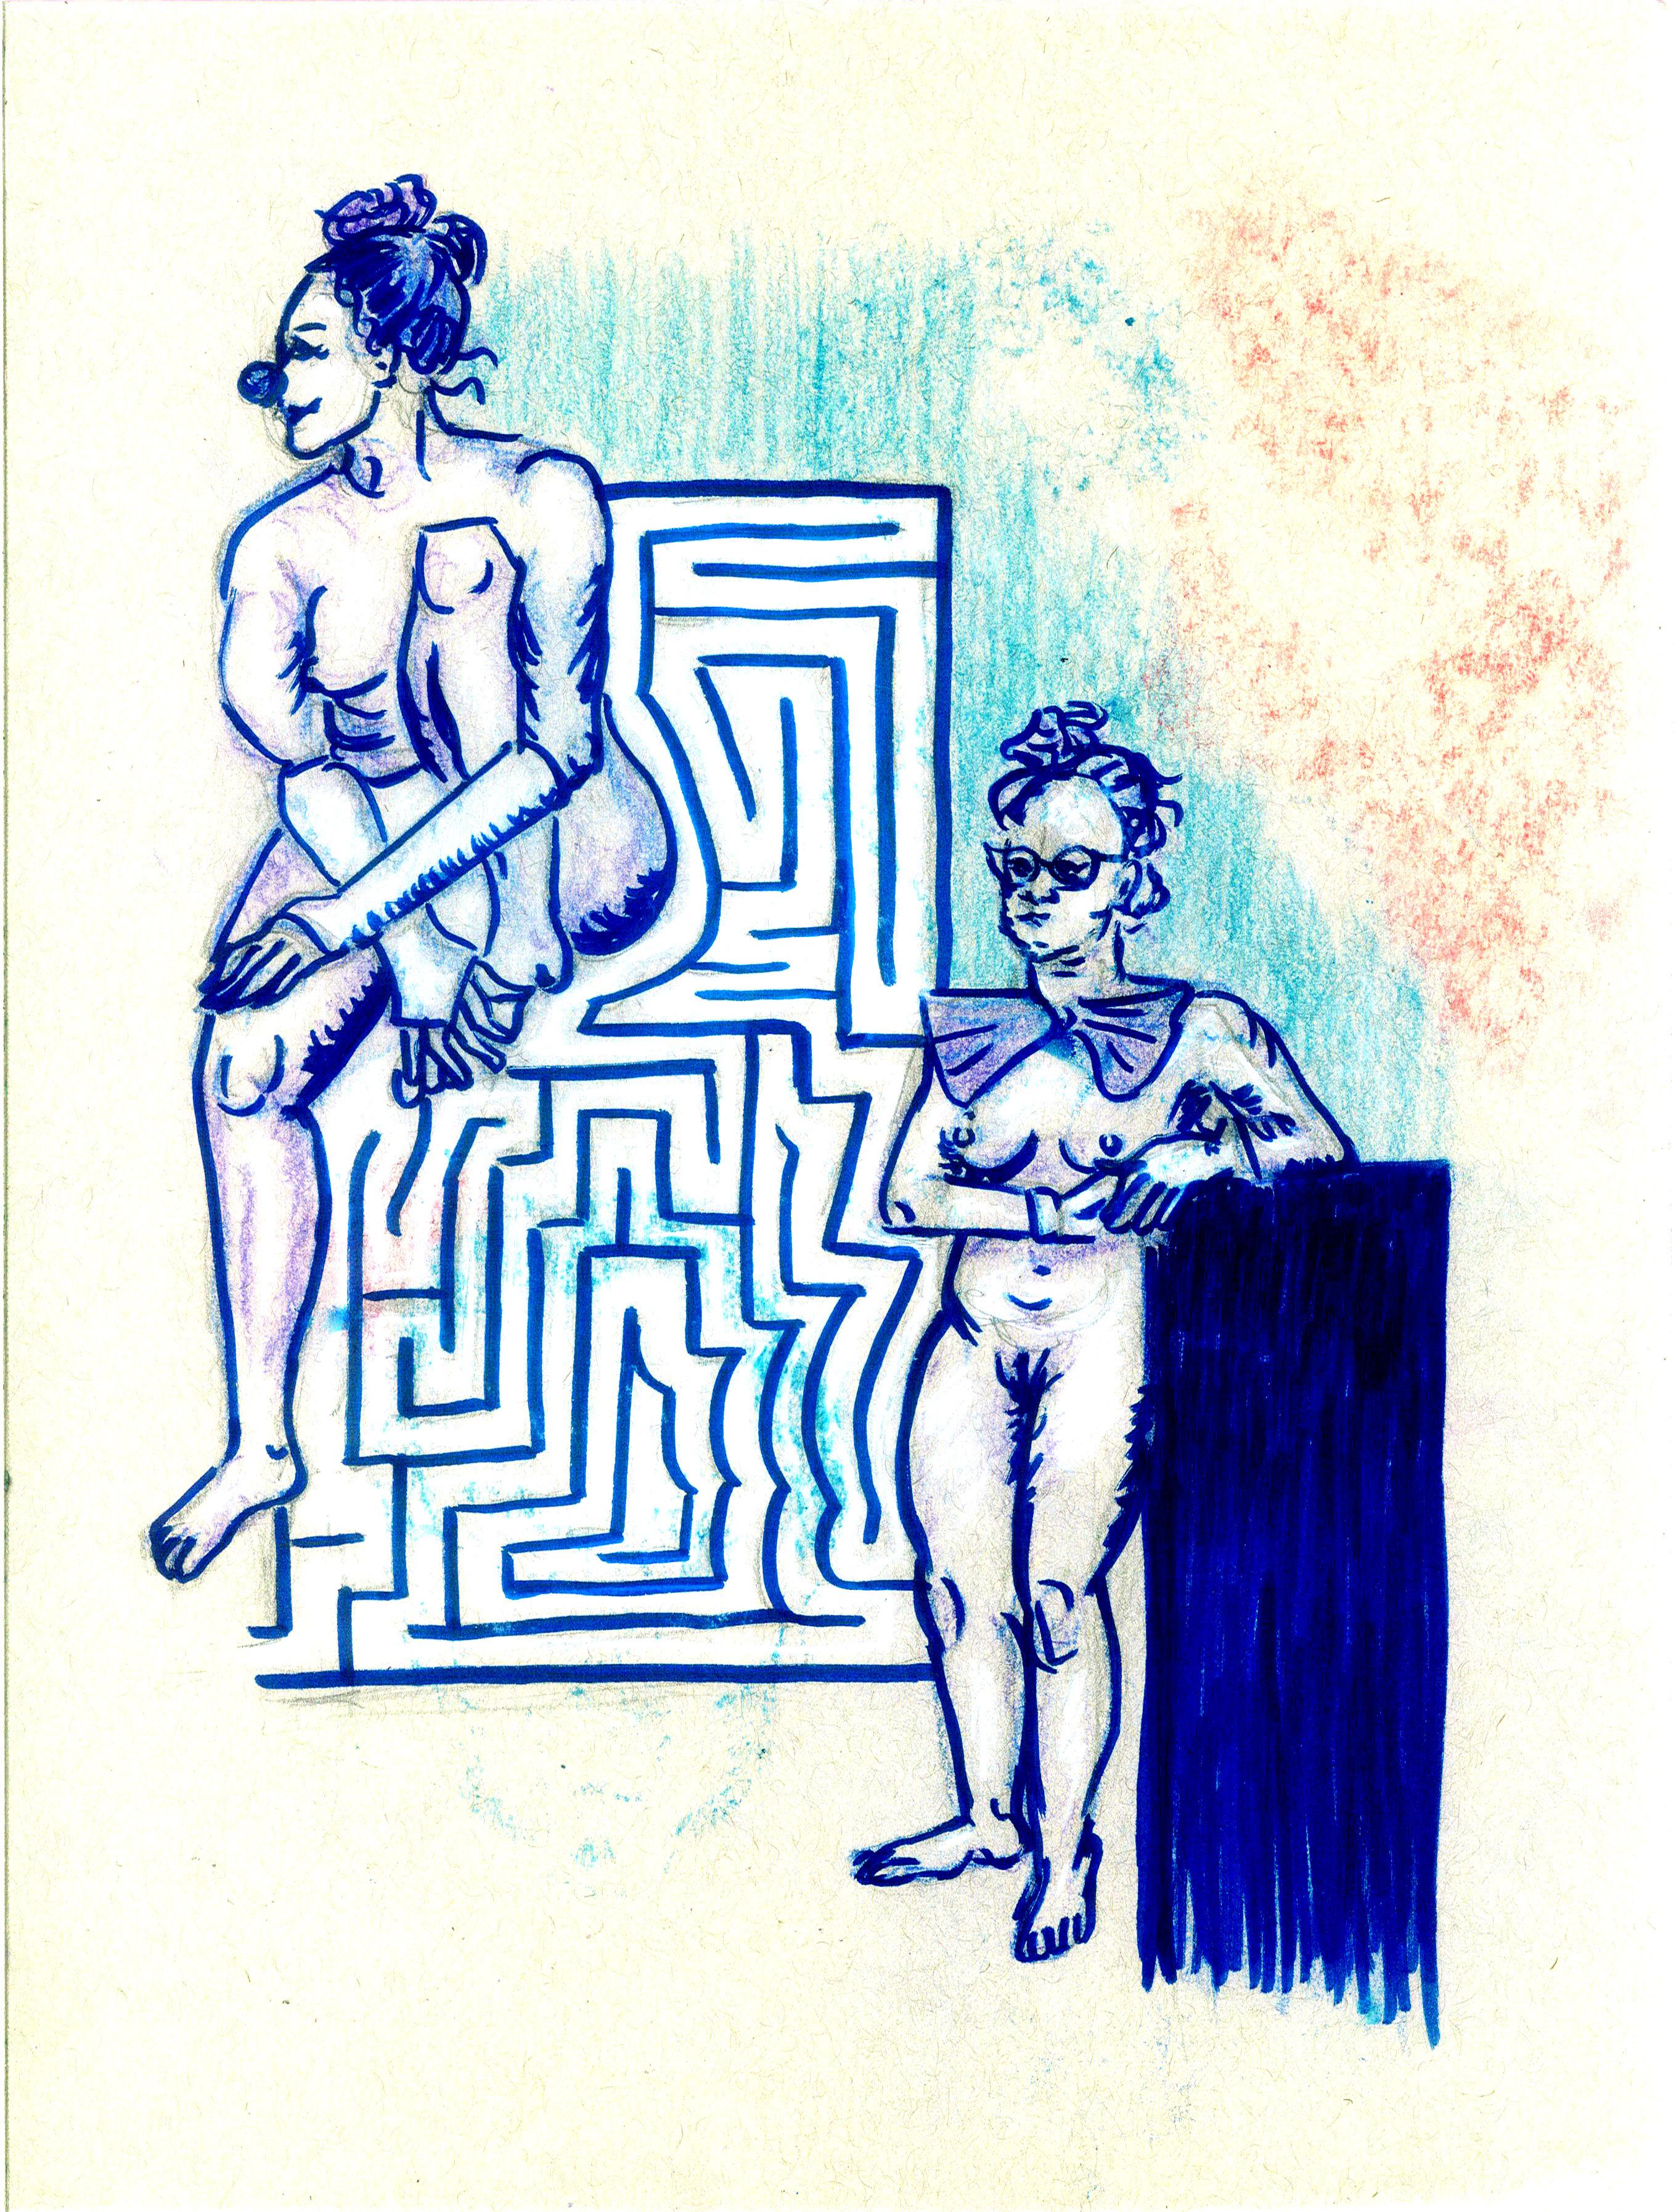 Labyrinth11